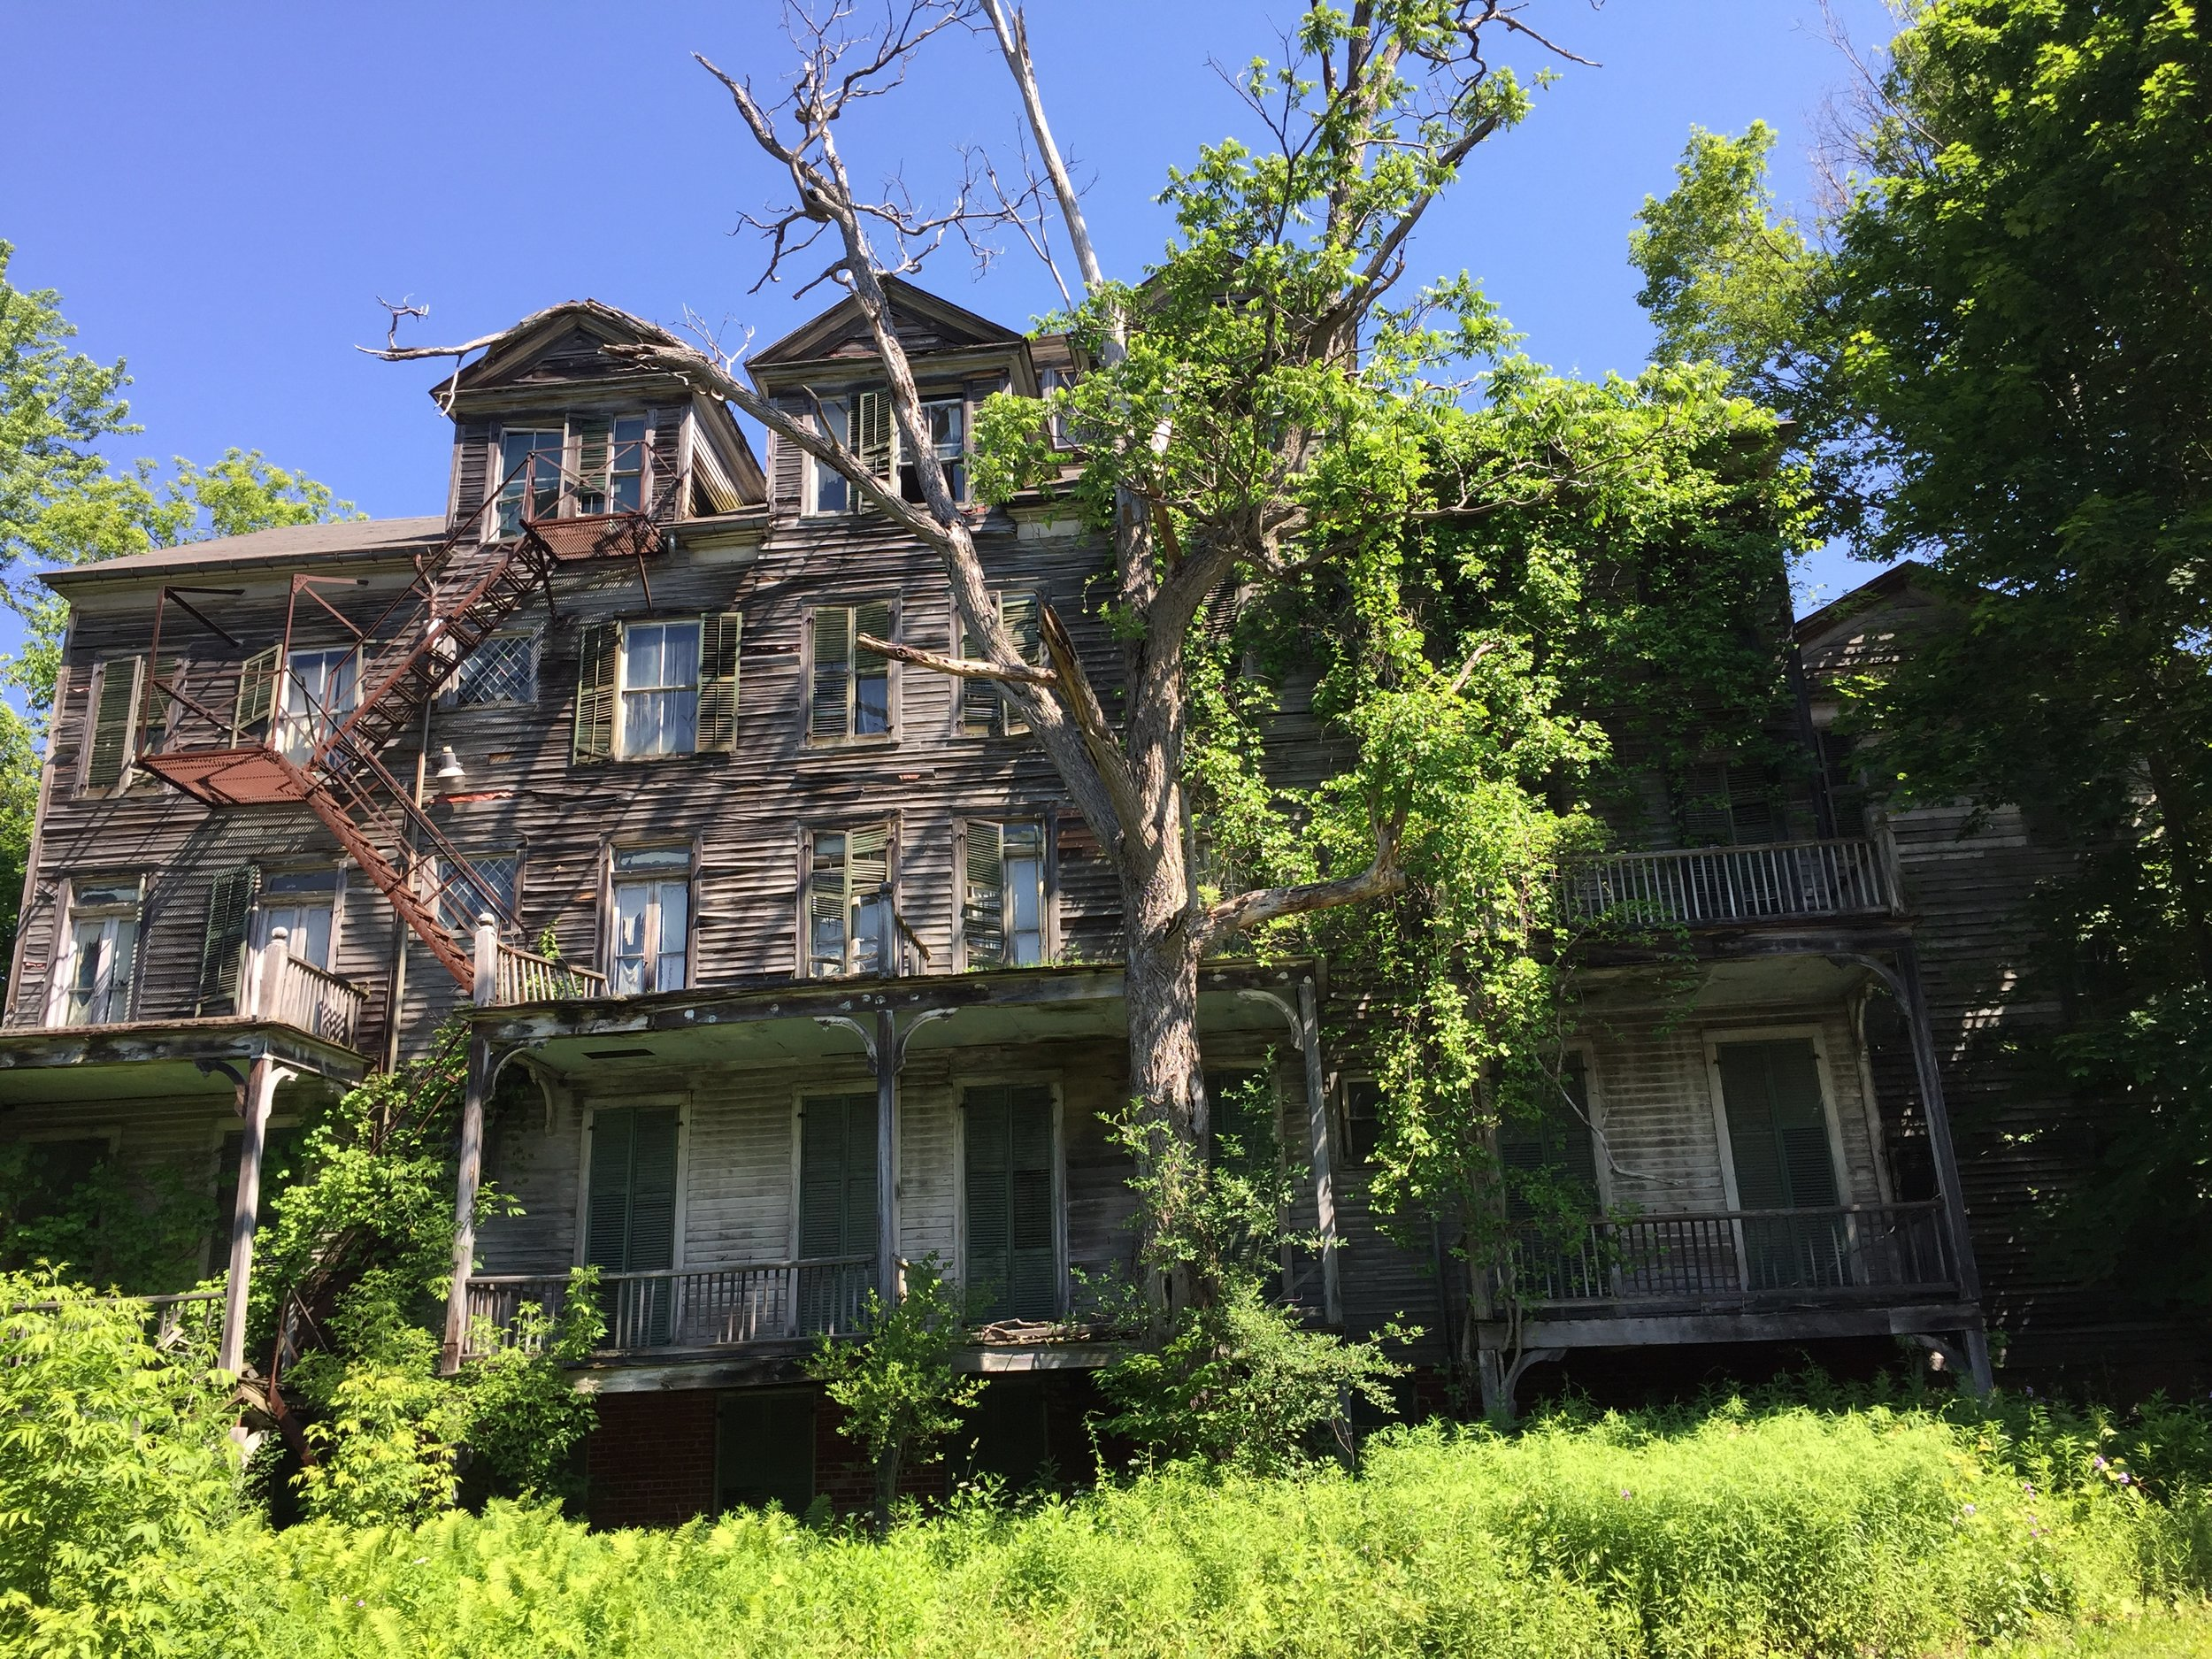 old antique home vermont.JPG